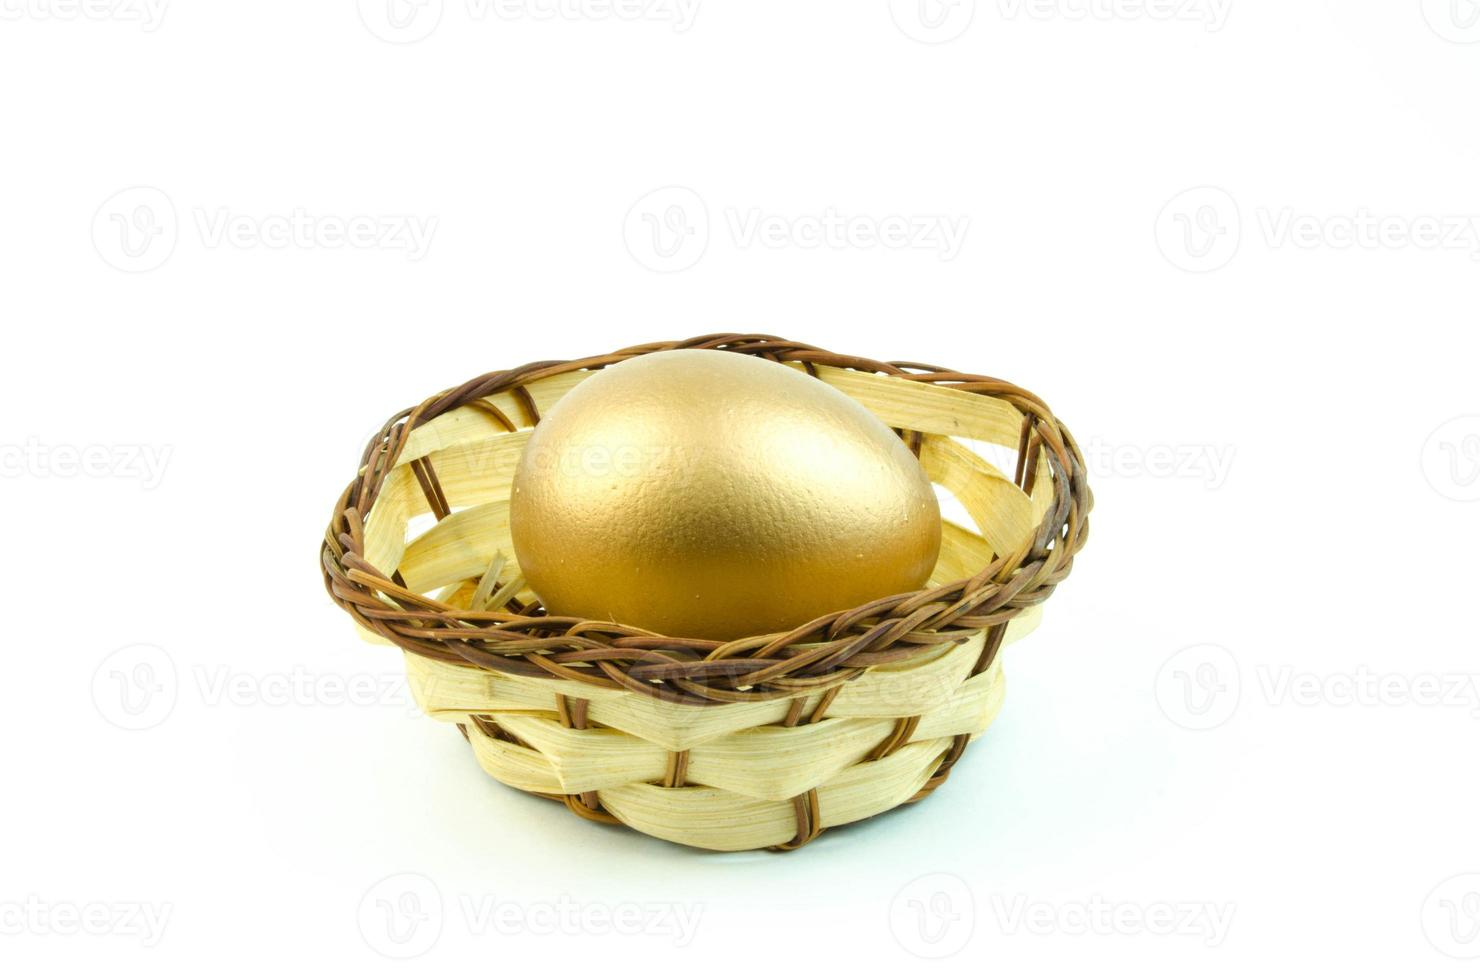 anel de ouro brilhante foto